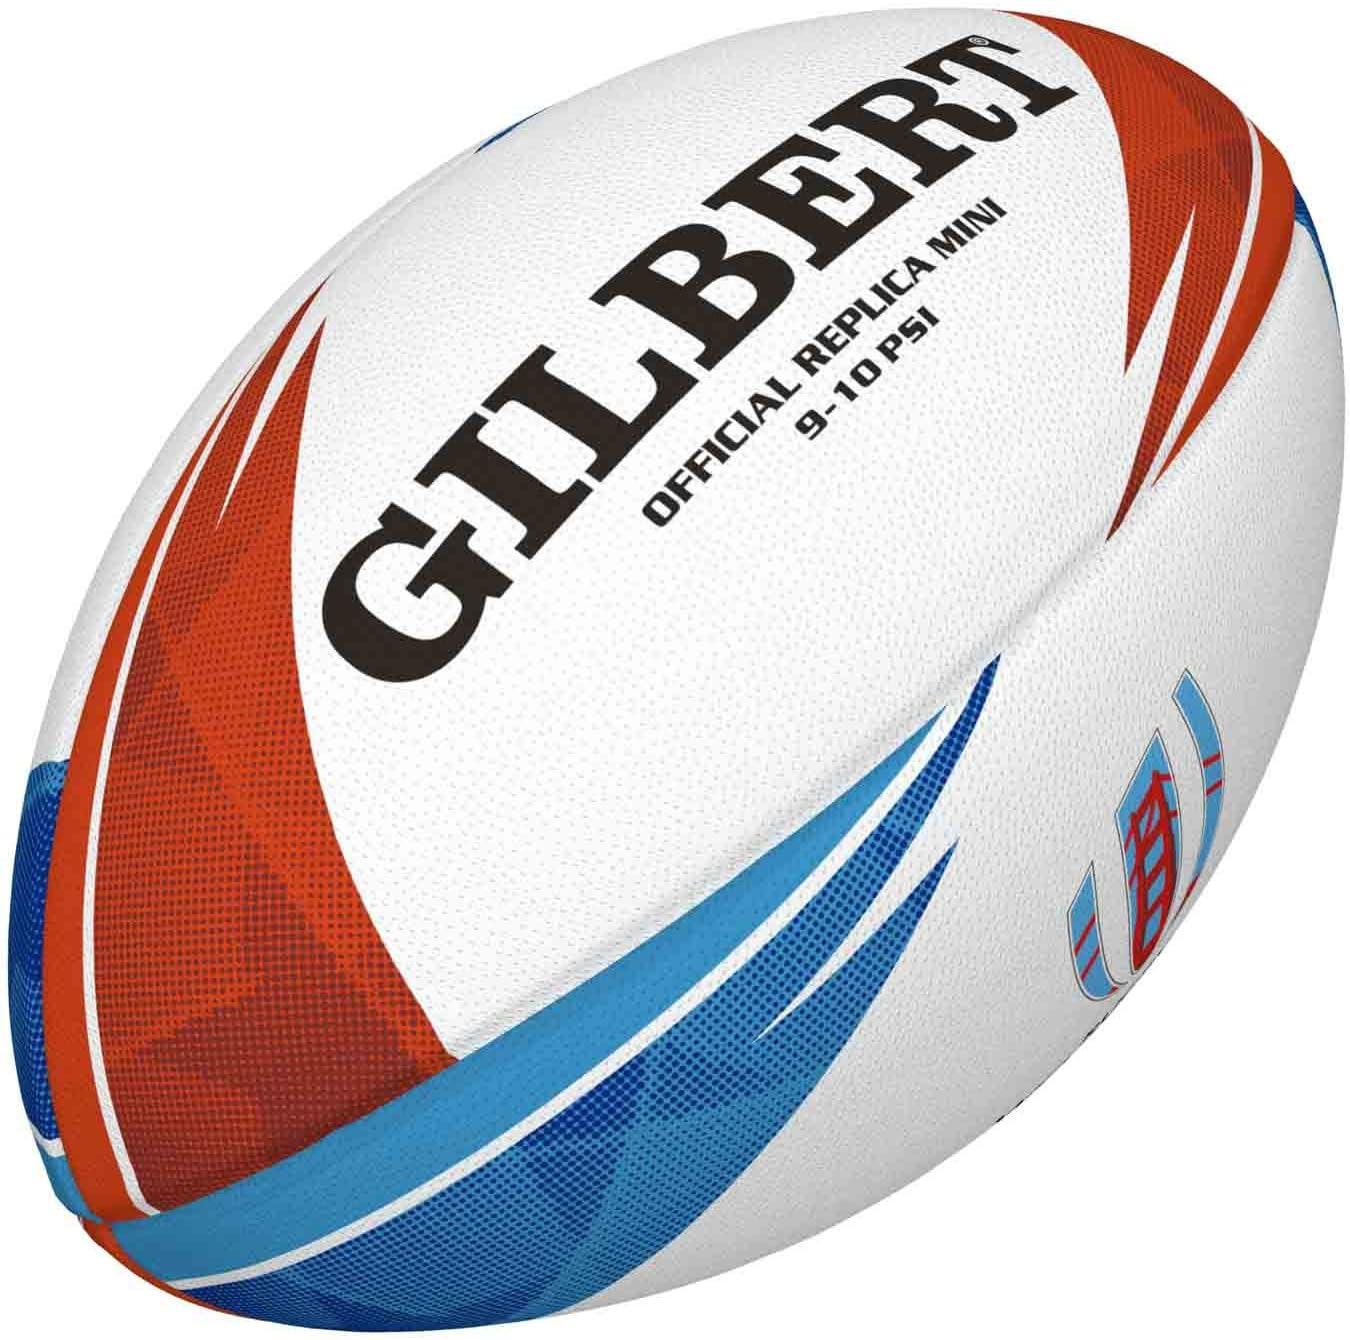 Gilbert Rugby World Cup Sevens 2018 - Pelota de réplica, Color ...